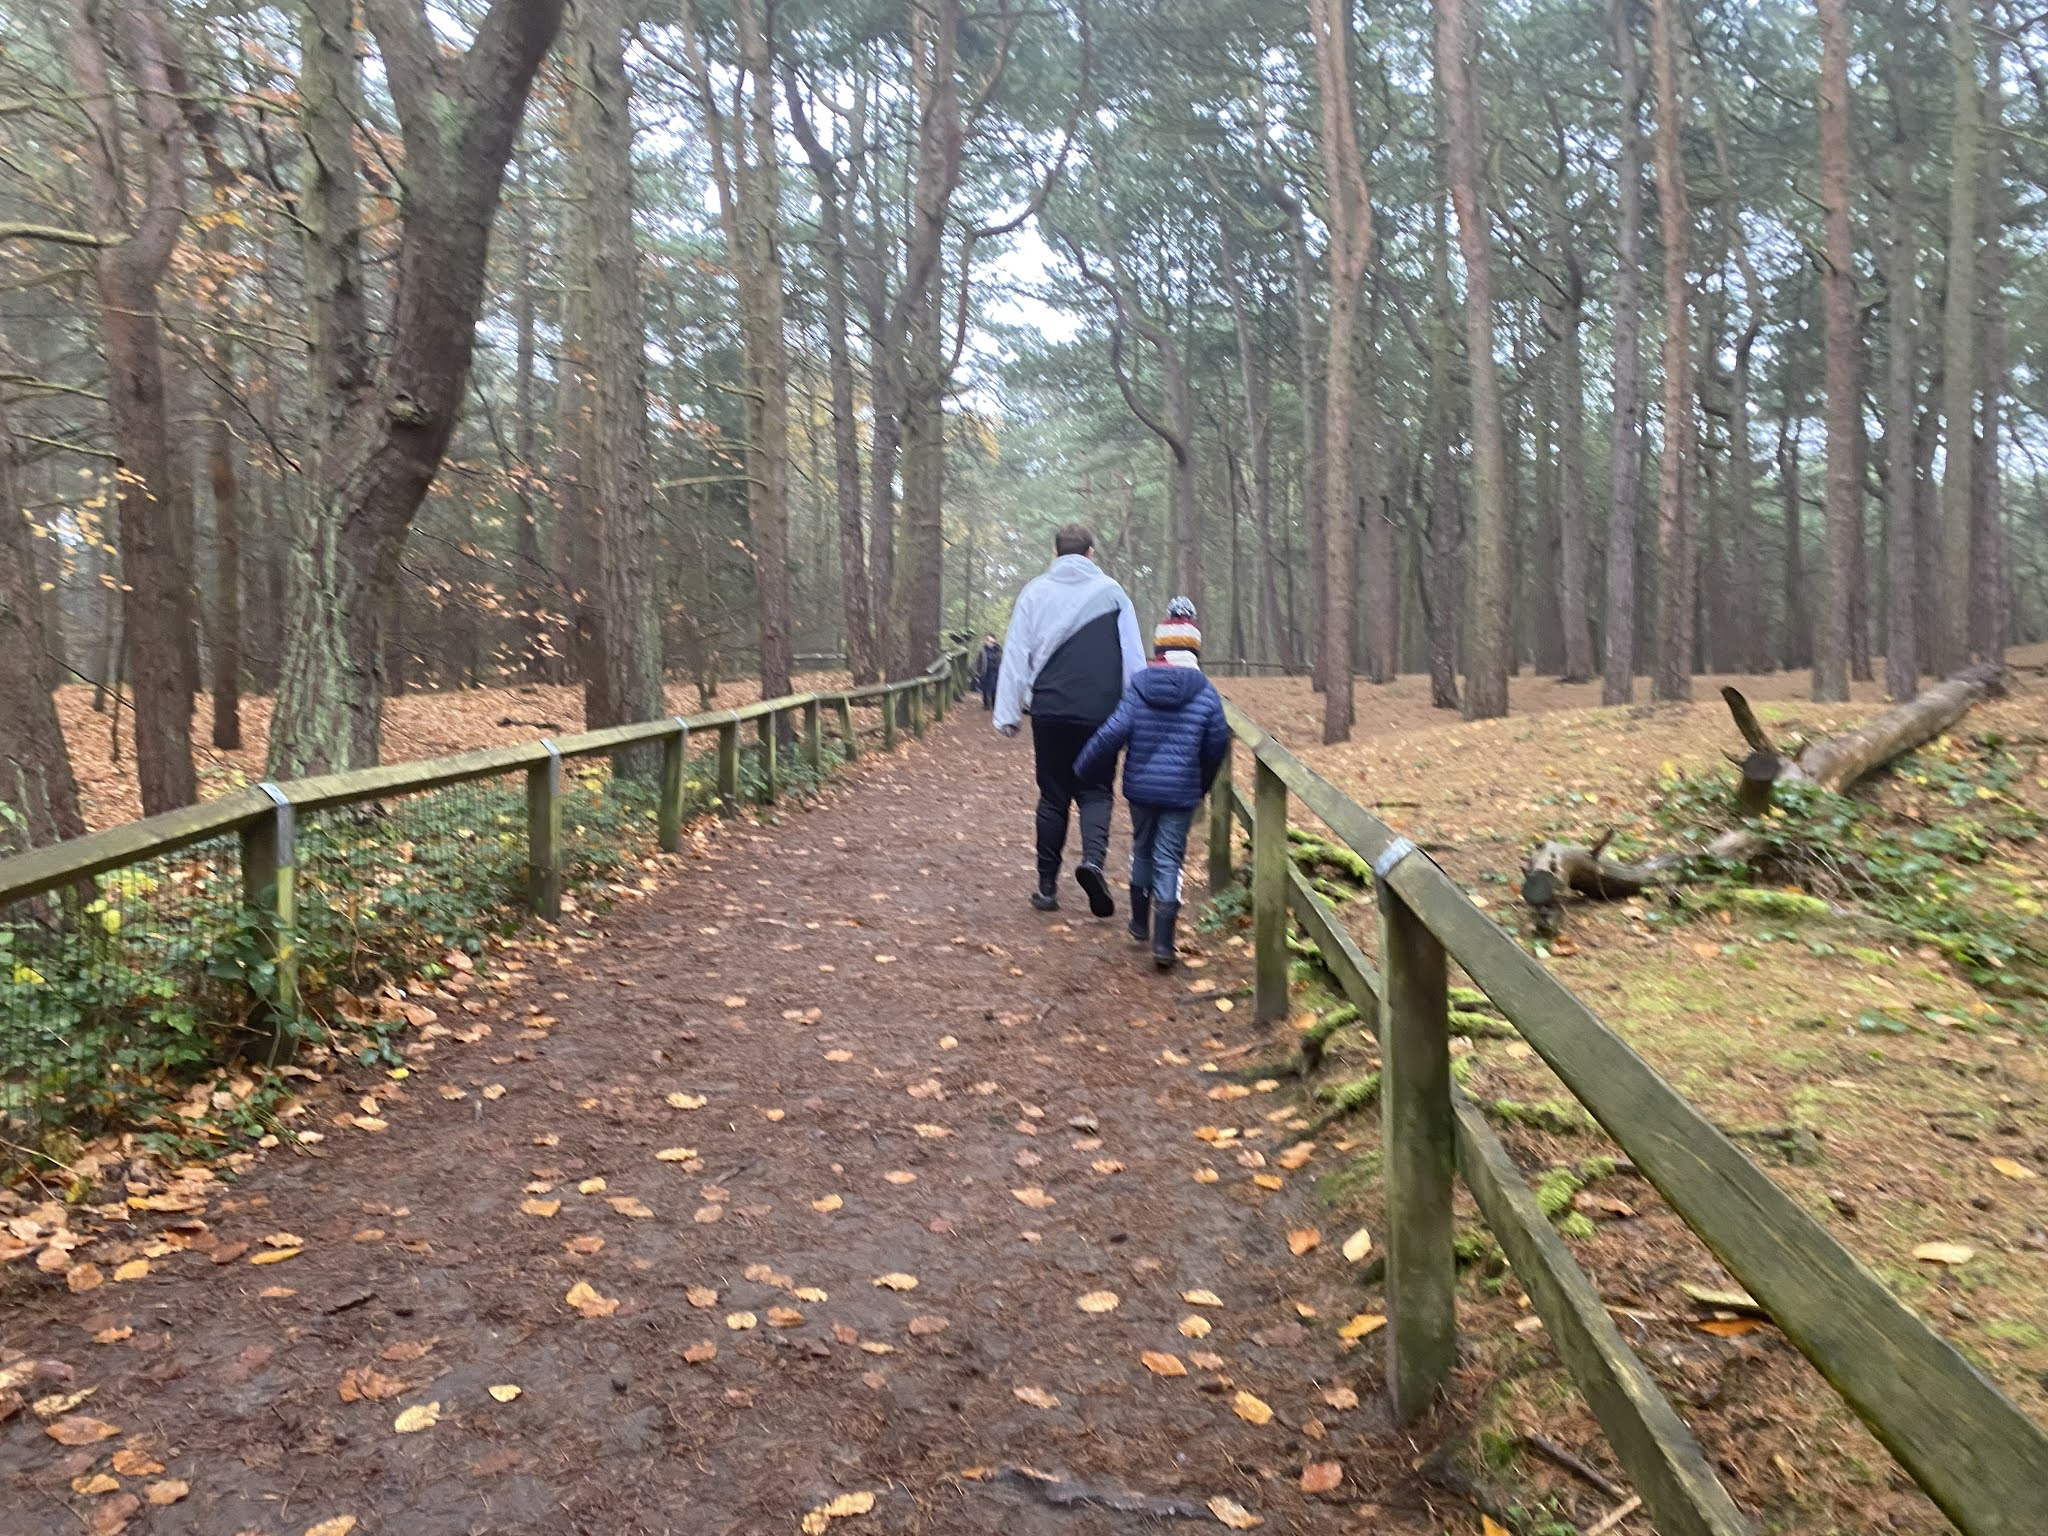 boys walking through the woods